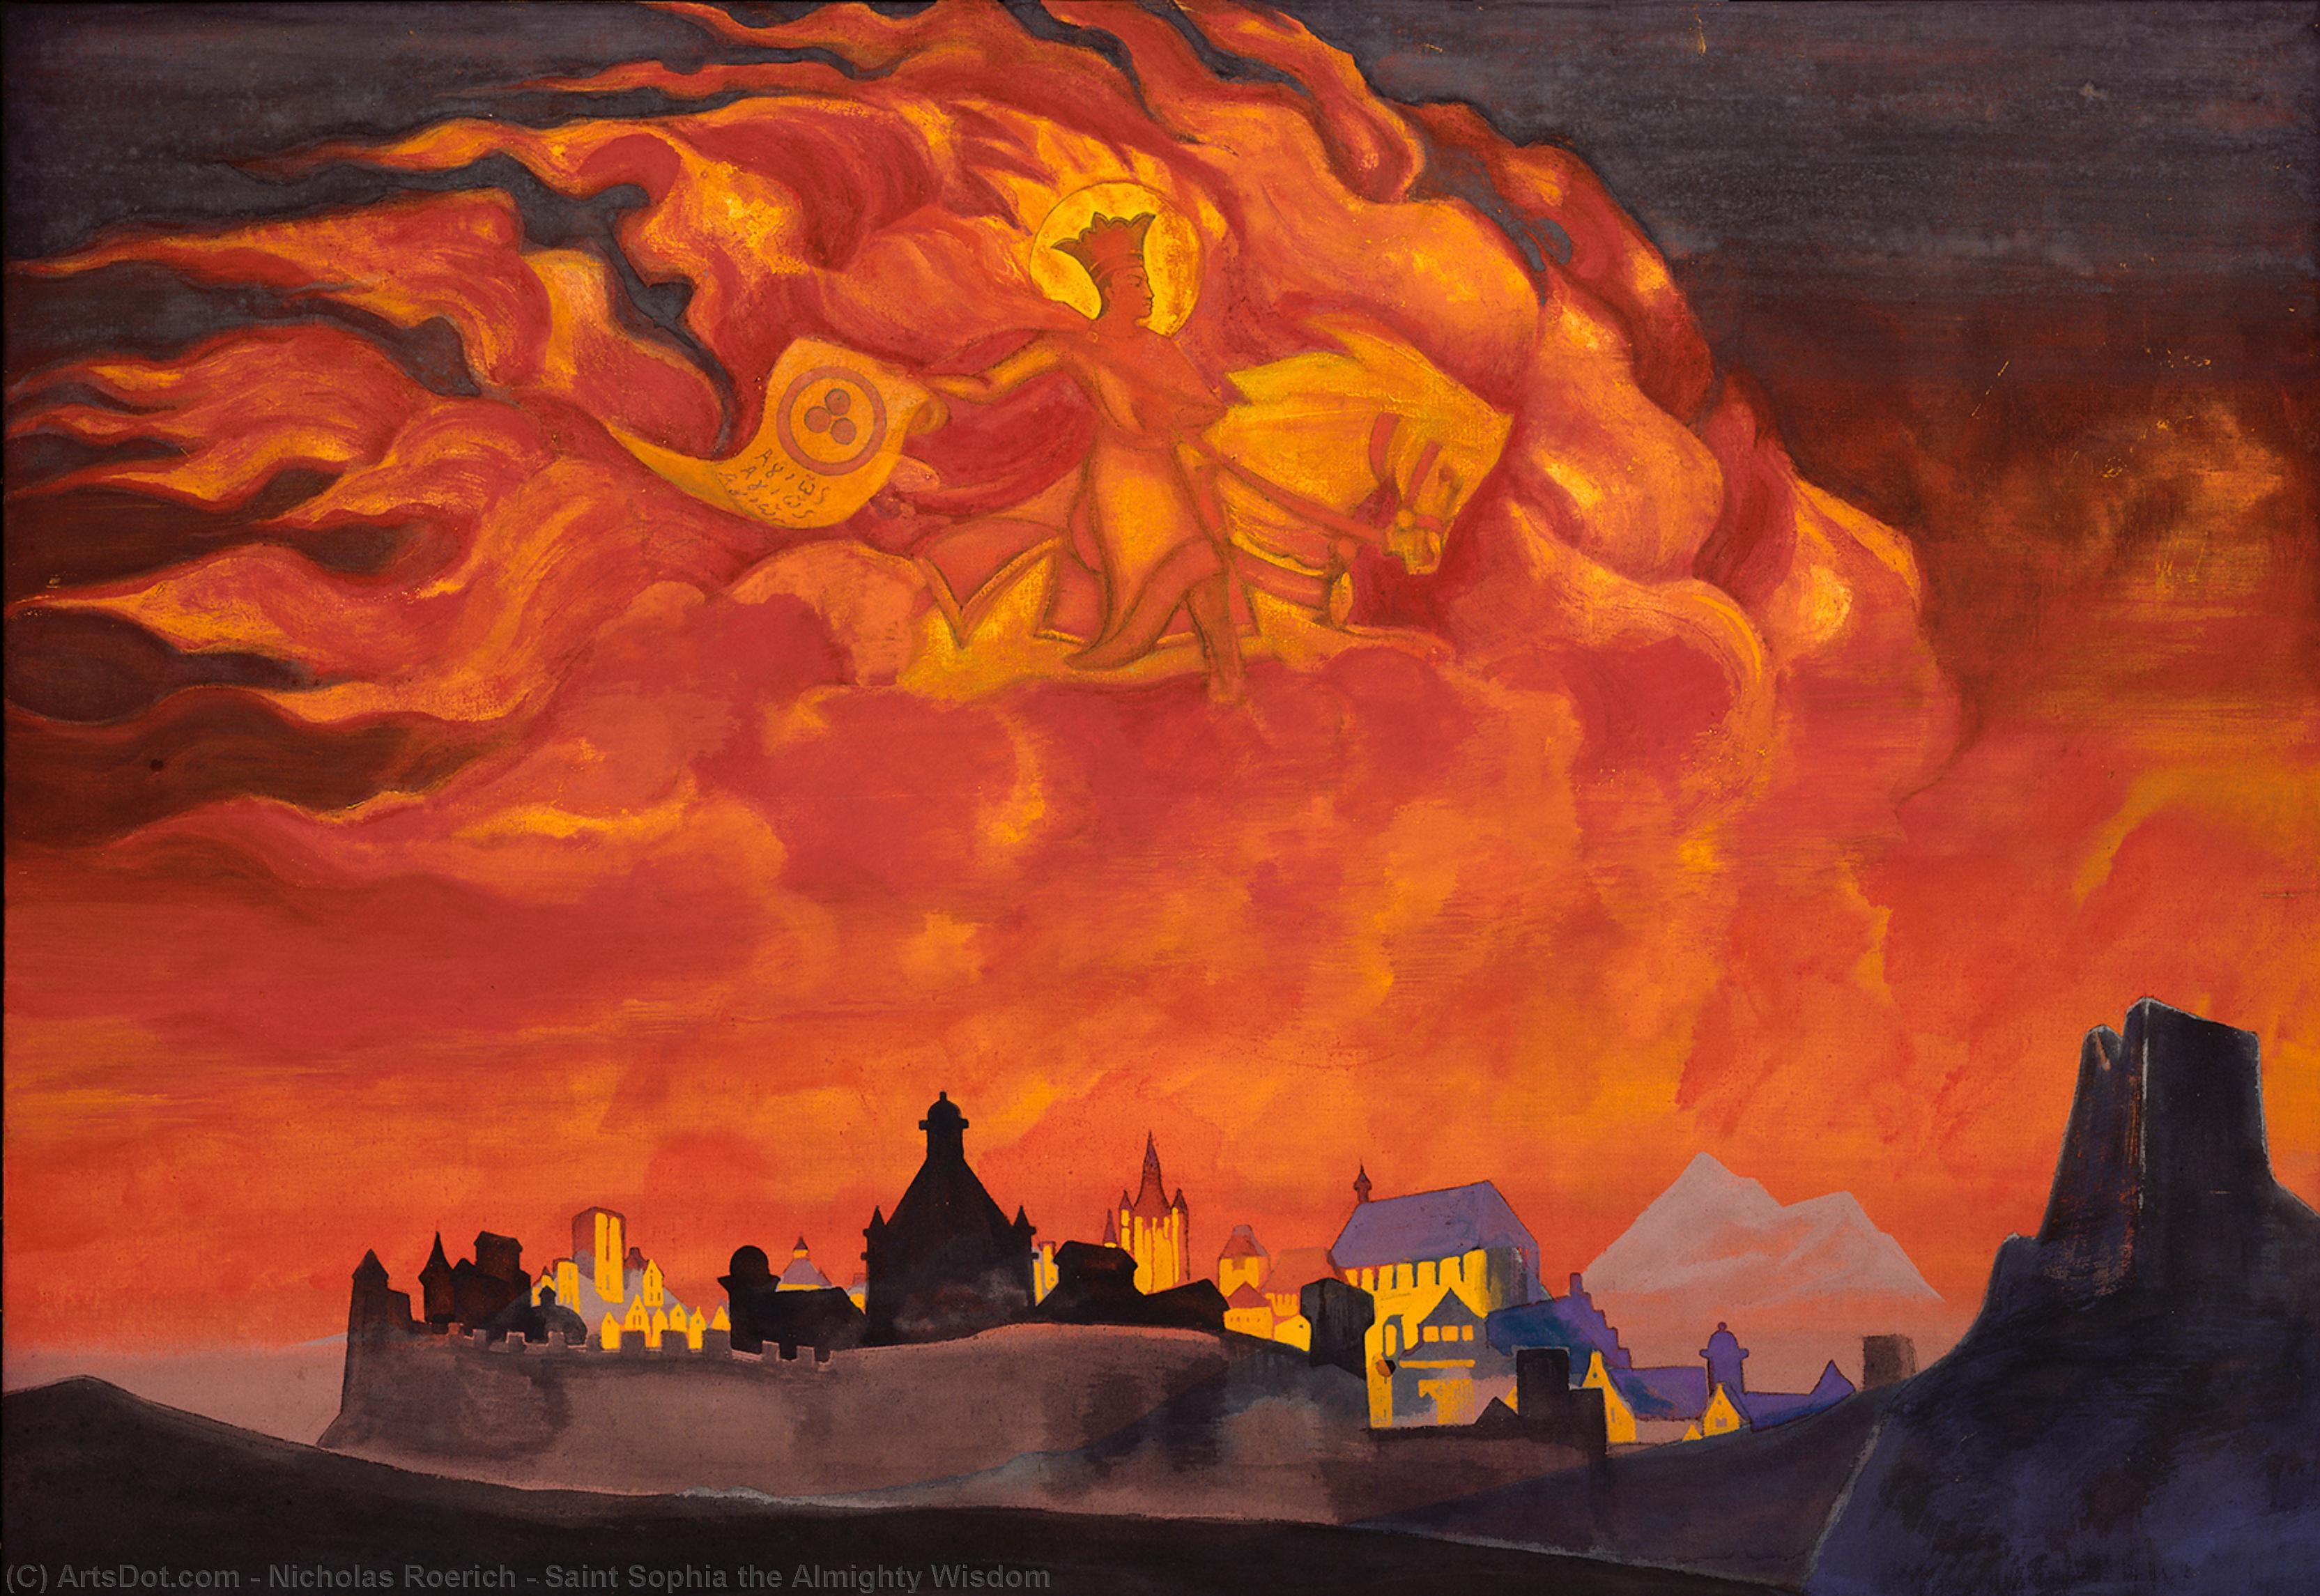 Wikoo.org - موسوعة الفنون الجميلة - اللوحة، العمل الفني Nicholas Roerich - Saint Sophia the Almighty Wisdom